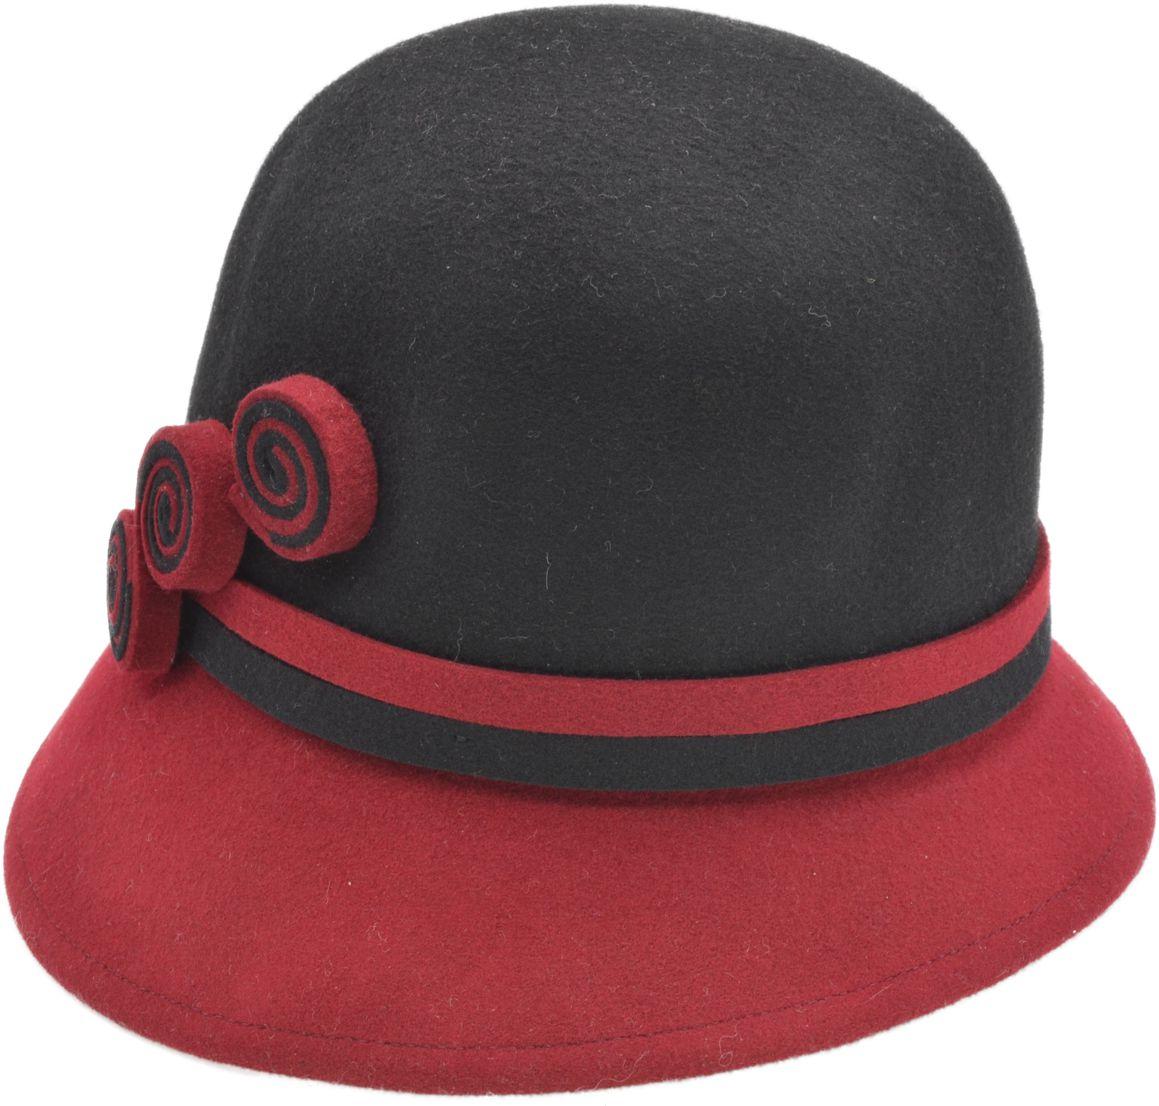 eae1726bl_chapeau-cloche-pin-up-40-s-50-s-retro-glamour